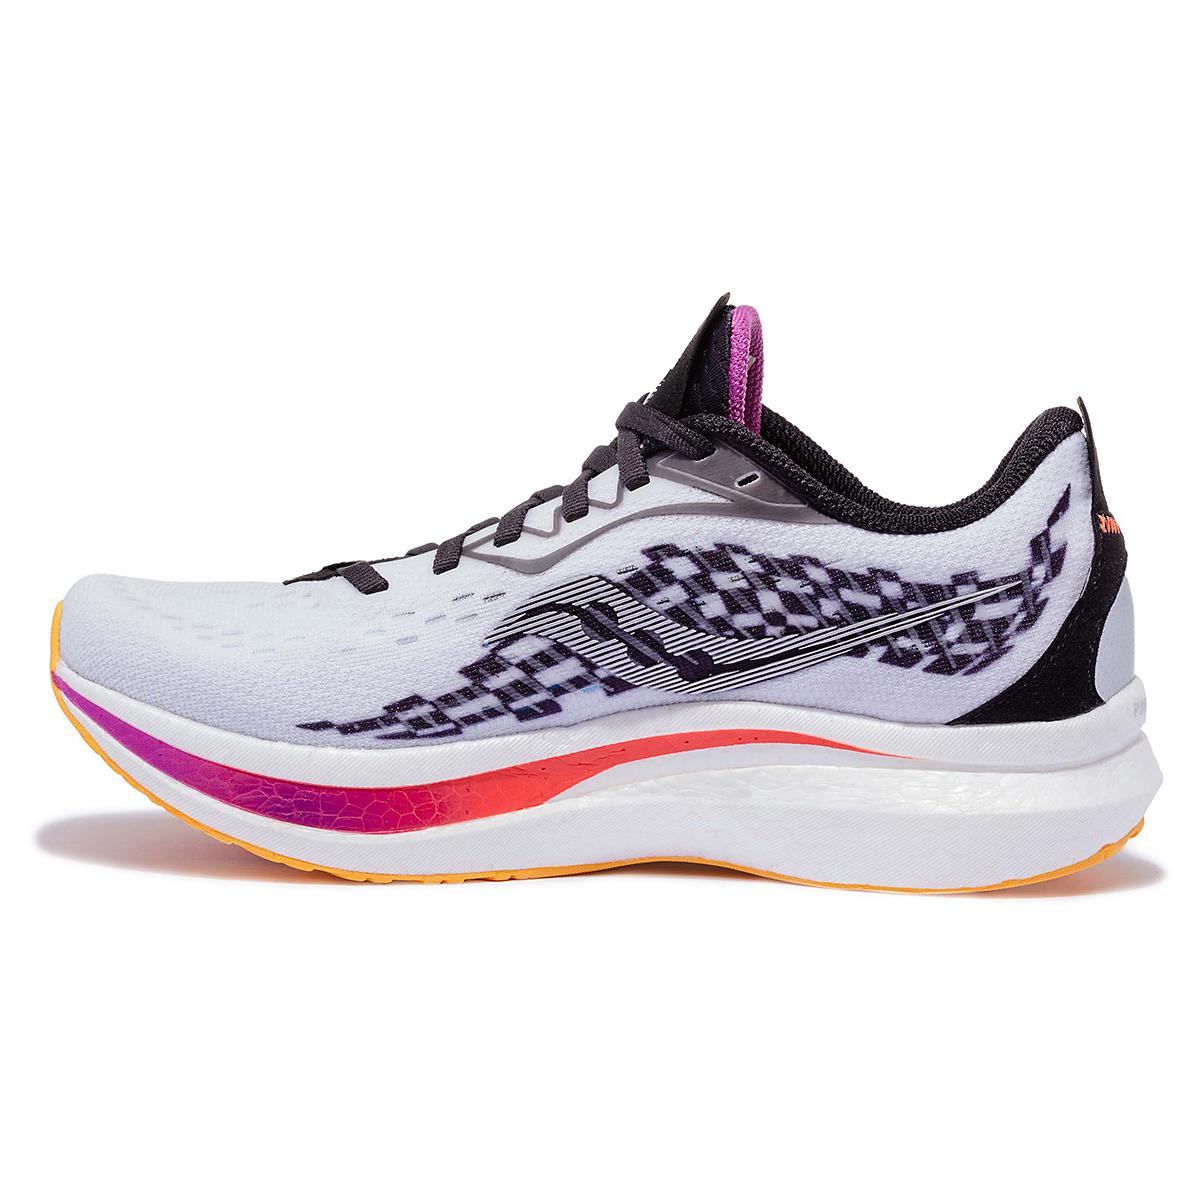 Women's Saucony Endorphin Speed 2 Running Shoe - Color: Reverie - Size: 5 - Width: Regular, Reverie, large, image 2